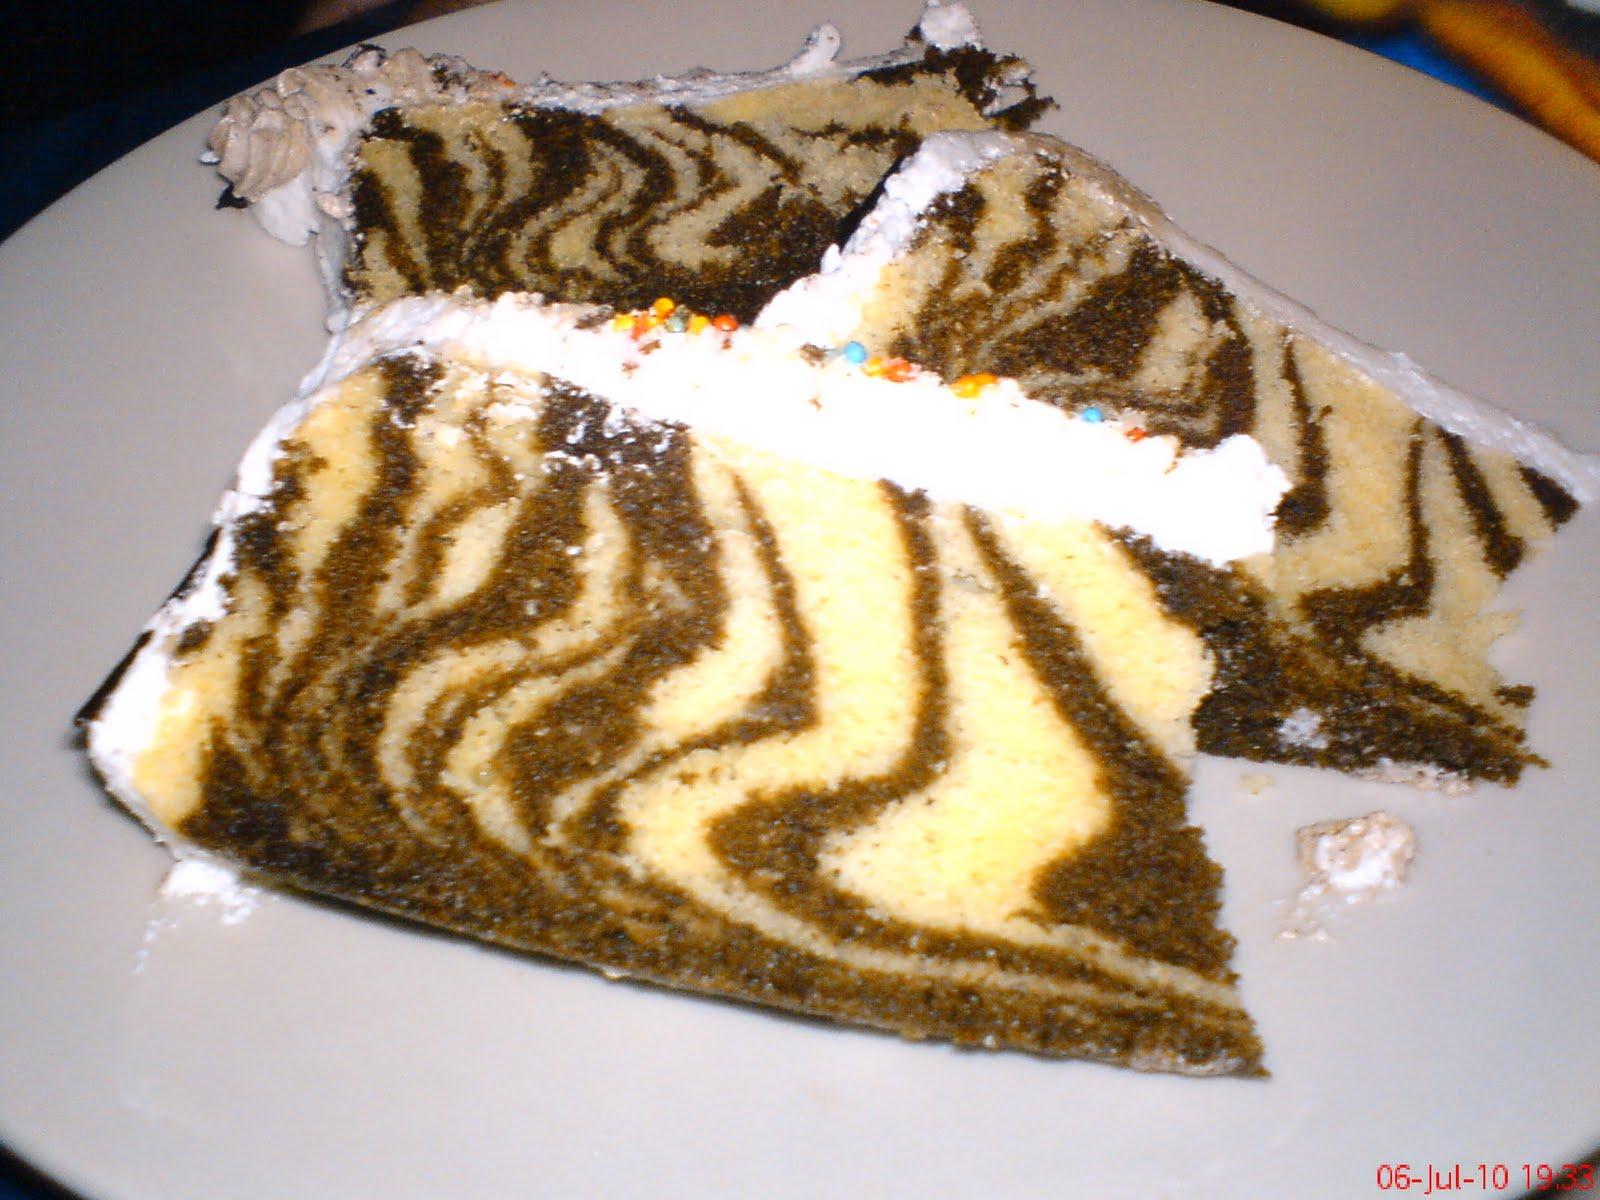 resep zebra cake kukus ncc enak dan lezat resep rainbow cake enak ...